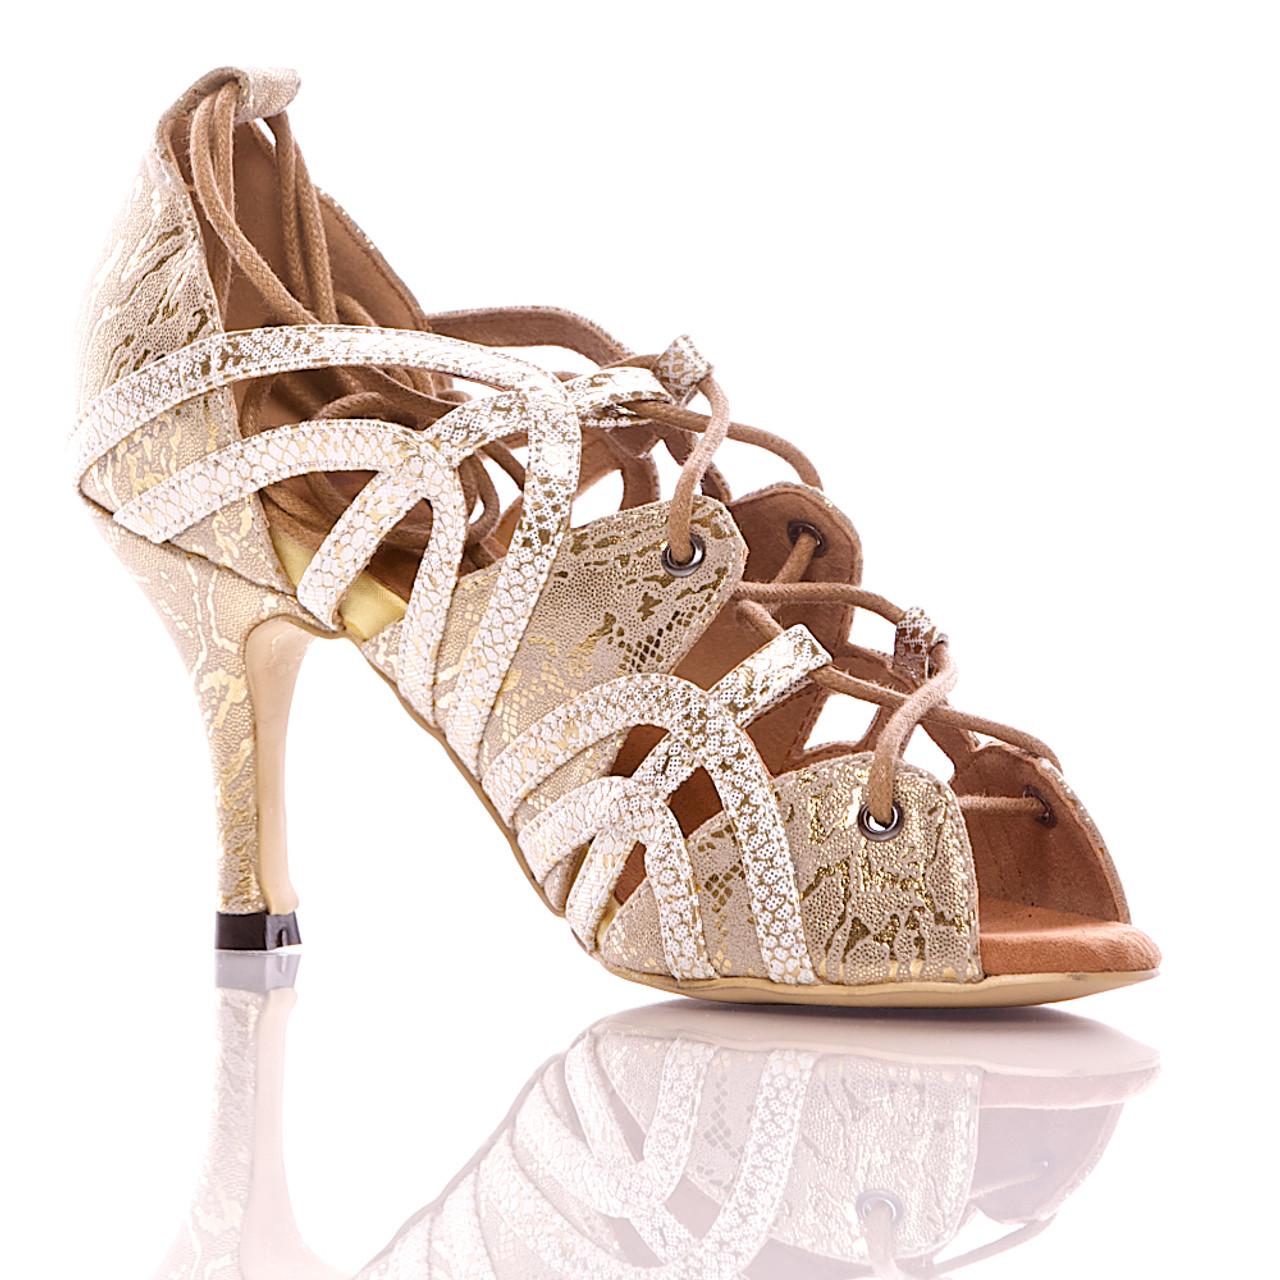 e526656fddf4 Vaneno - Nude And Gold Open Toe Lace Up Stiletto Sandal - 3 inch Heels - Burju  Shoes